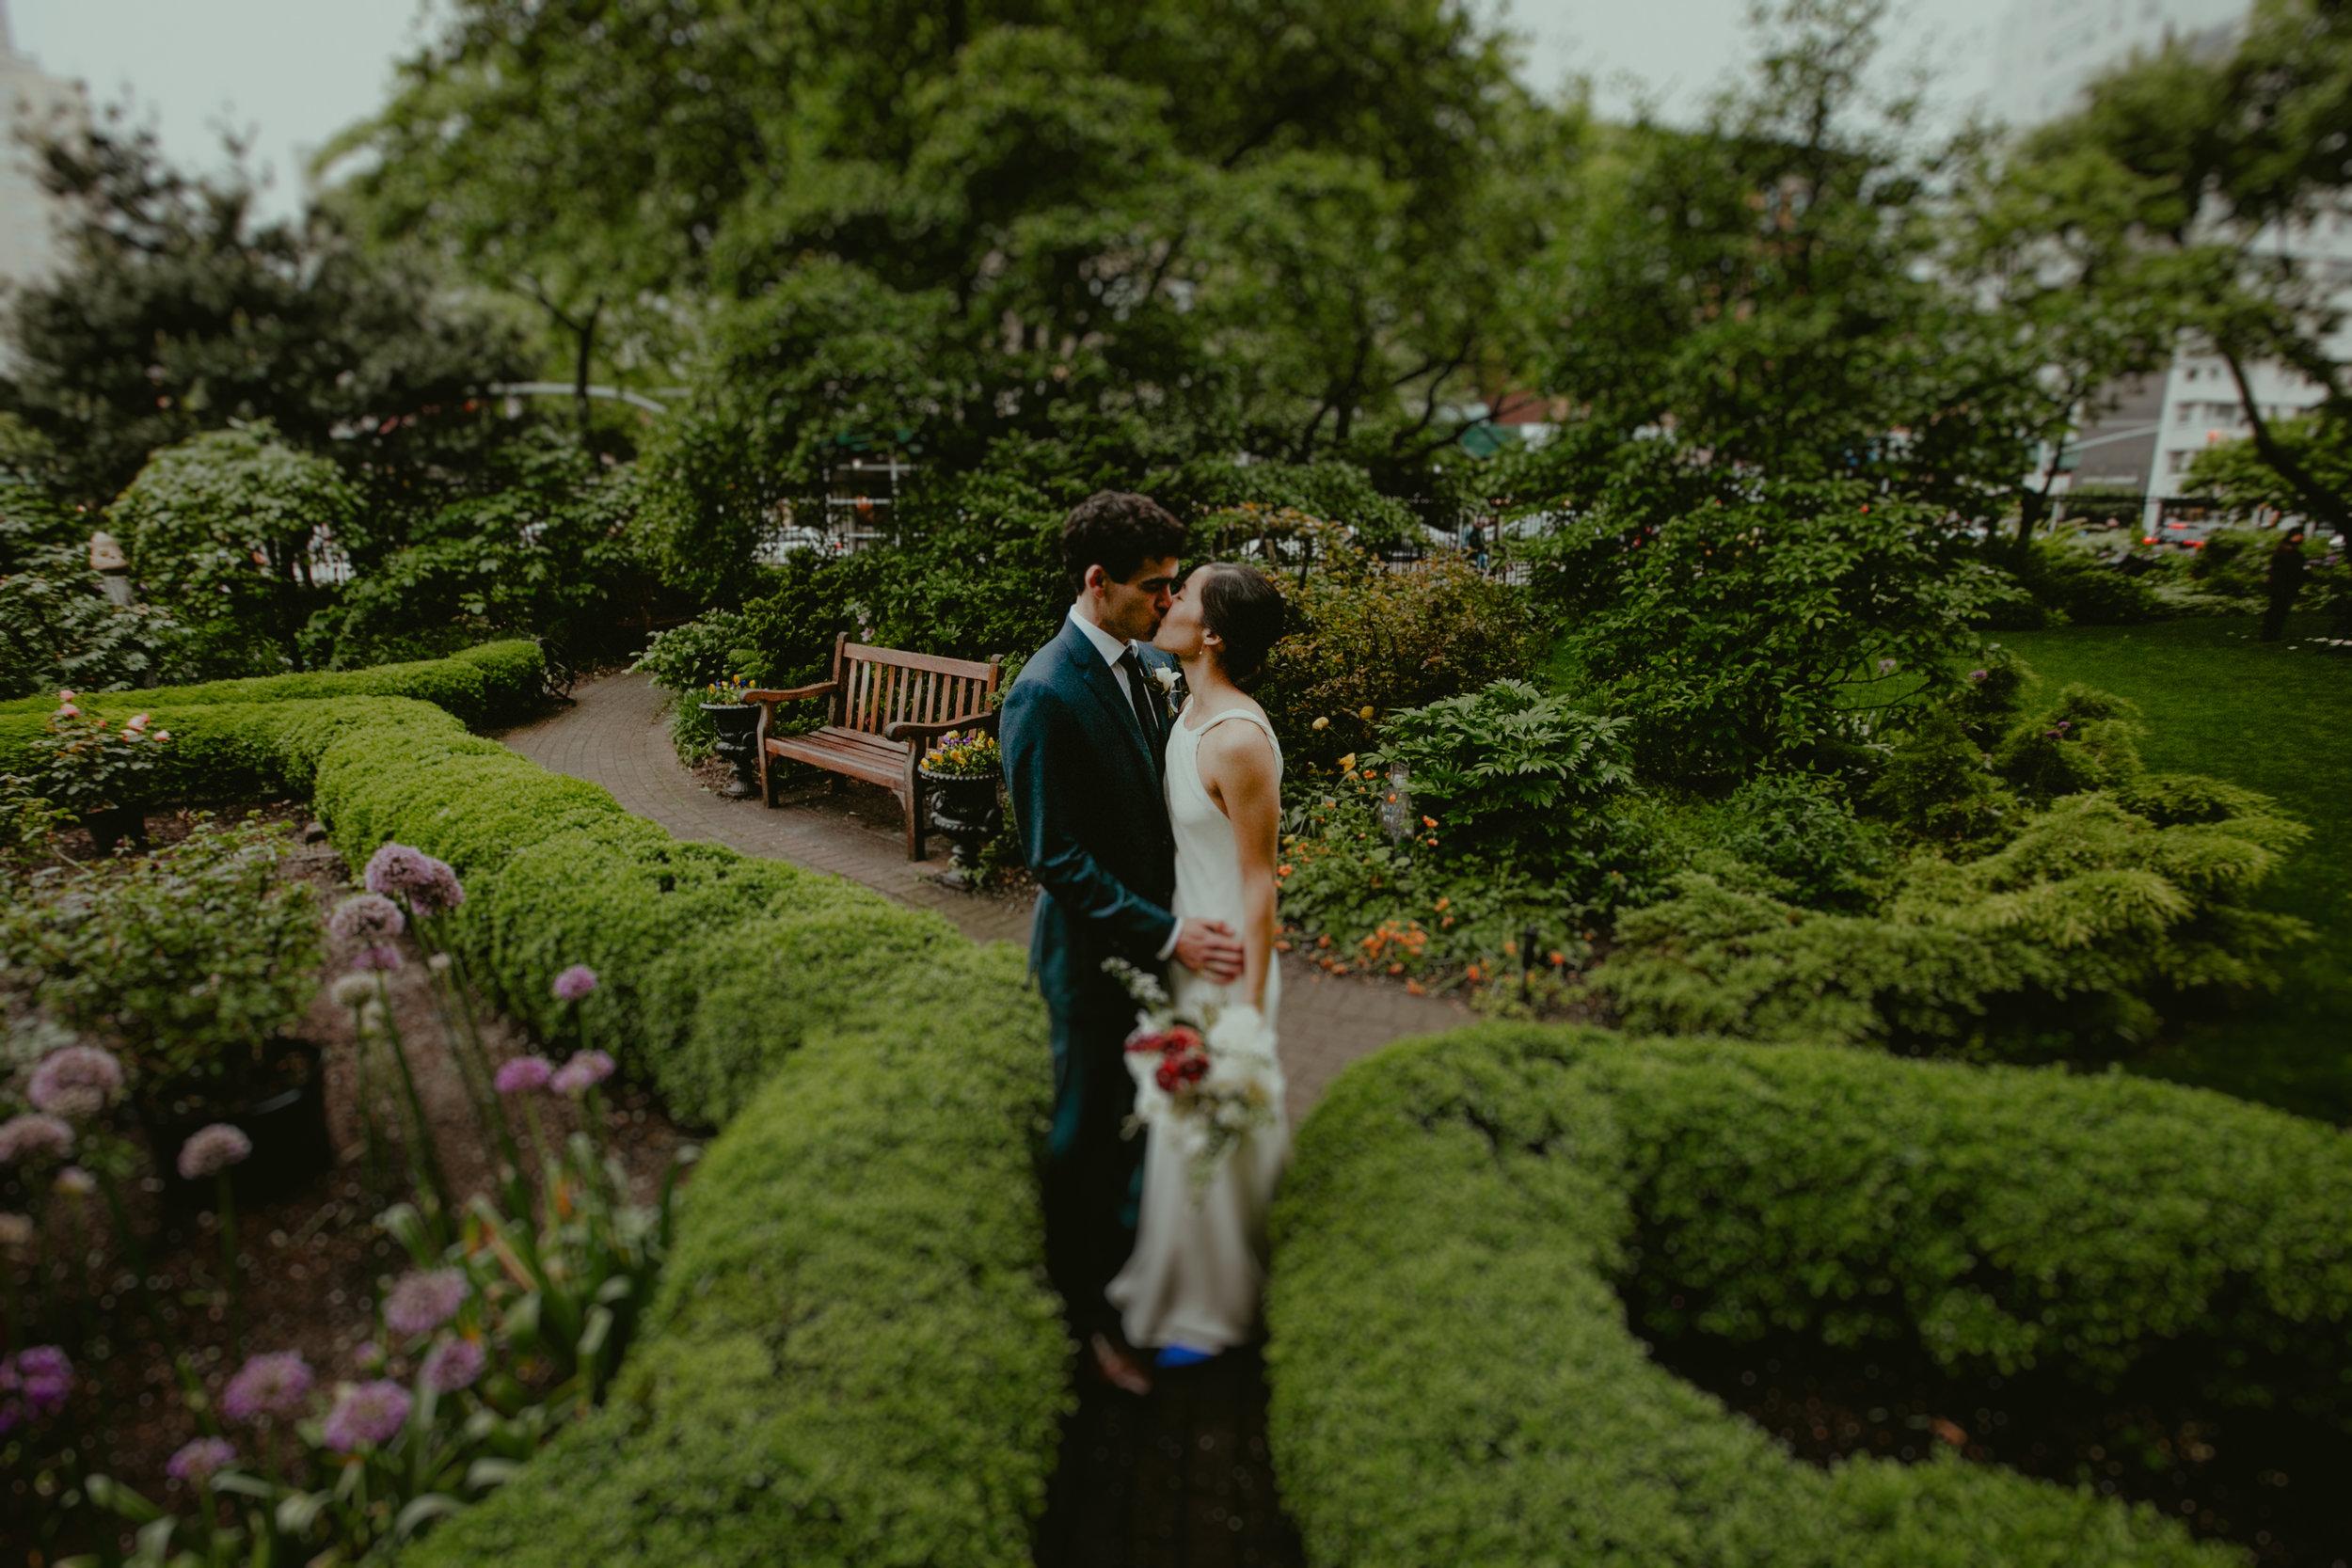 beekman hotel 472jefferson garden market wedding.JPG